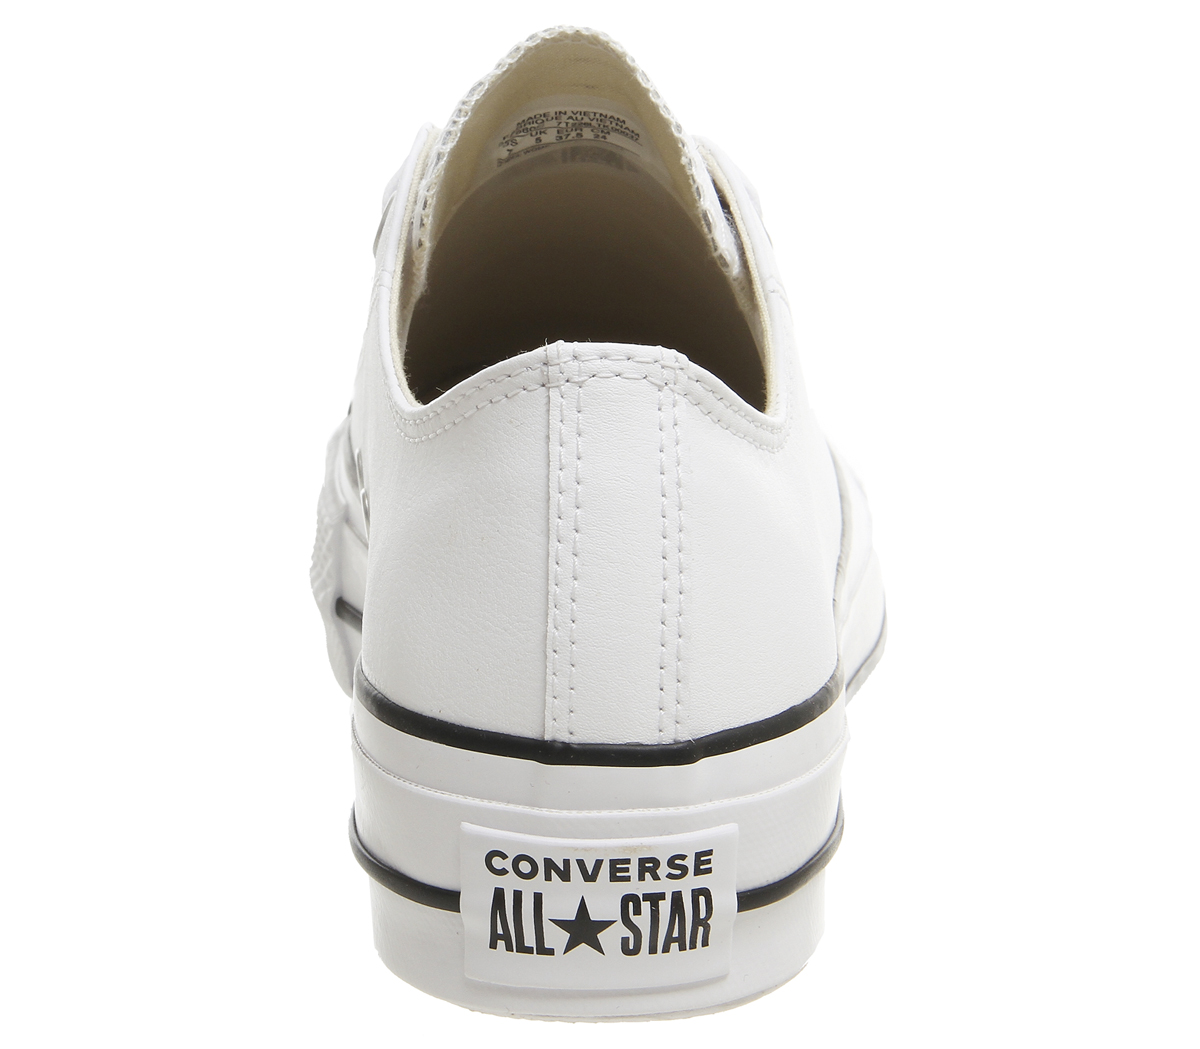 Damenschuhe Converse BLACK All Star Lift Niedrig Leder Trainers Weiß BLACK Converse Weiß Trainers Sh 7e0d9b